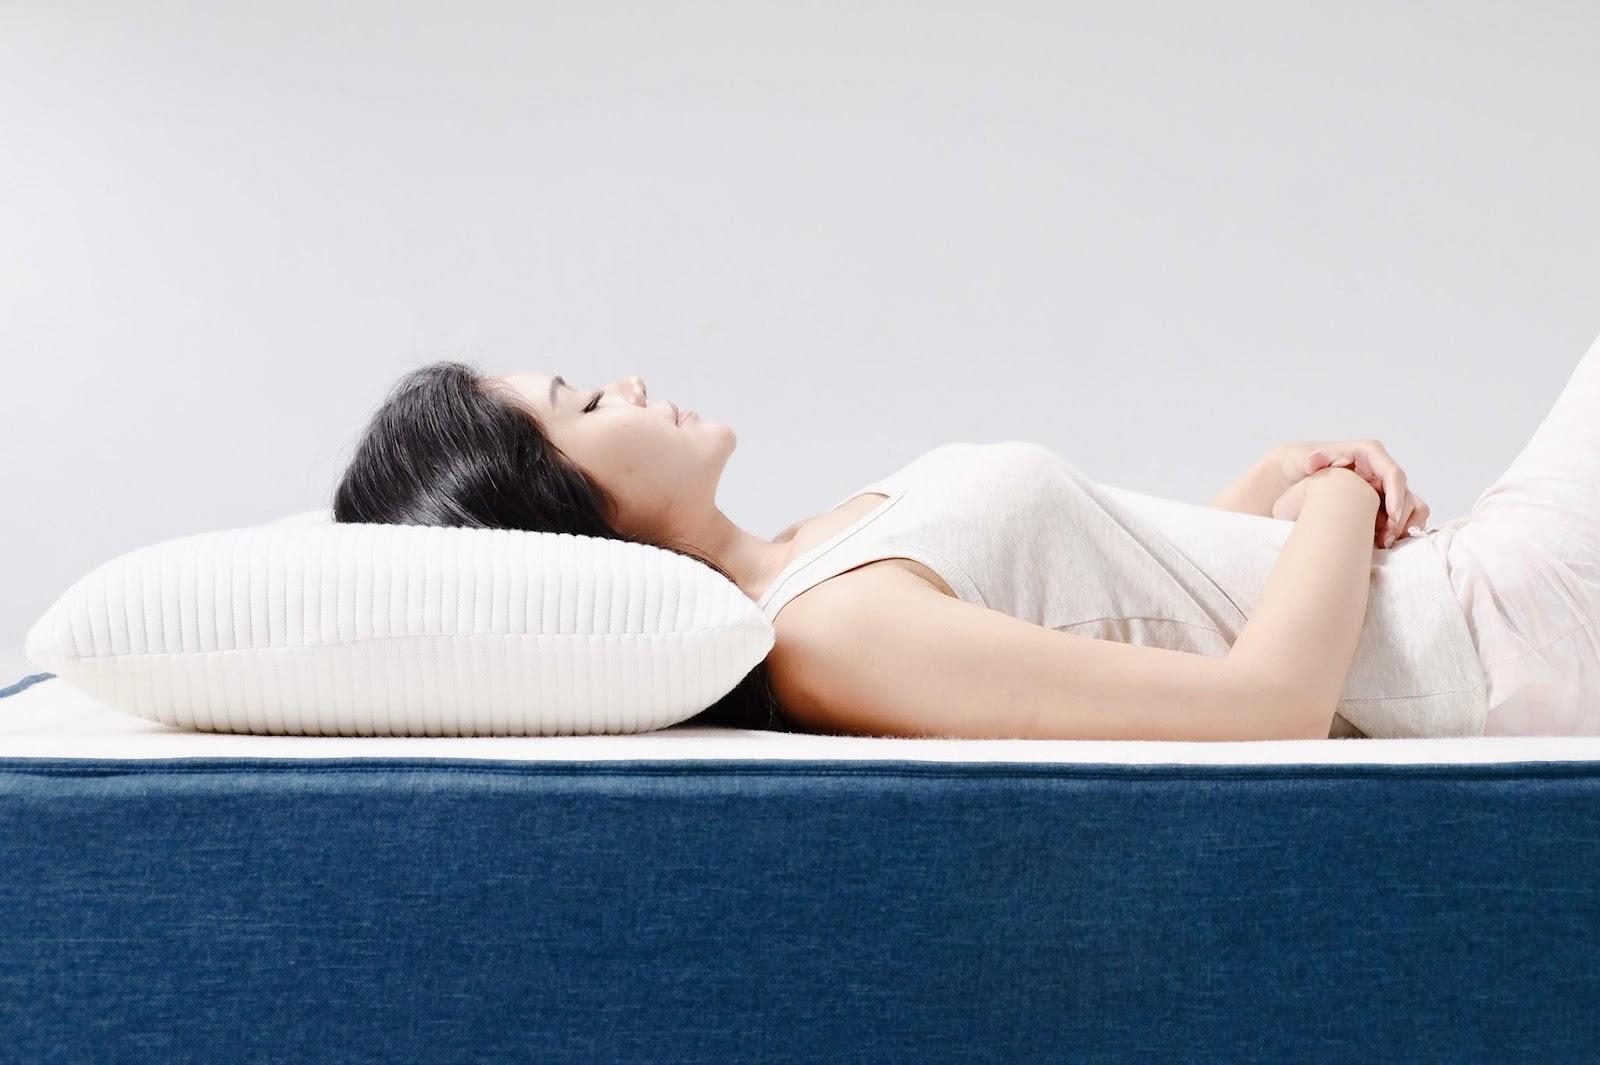 Gối Niu Ru9 tốt cho giấc ngủ